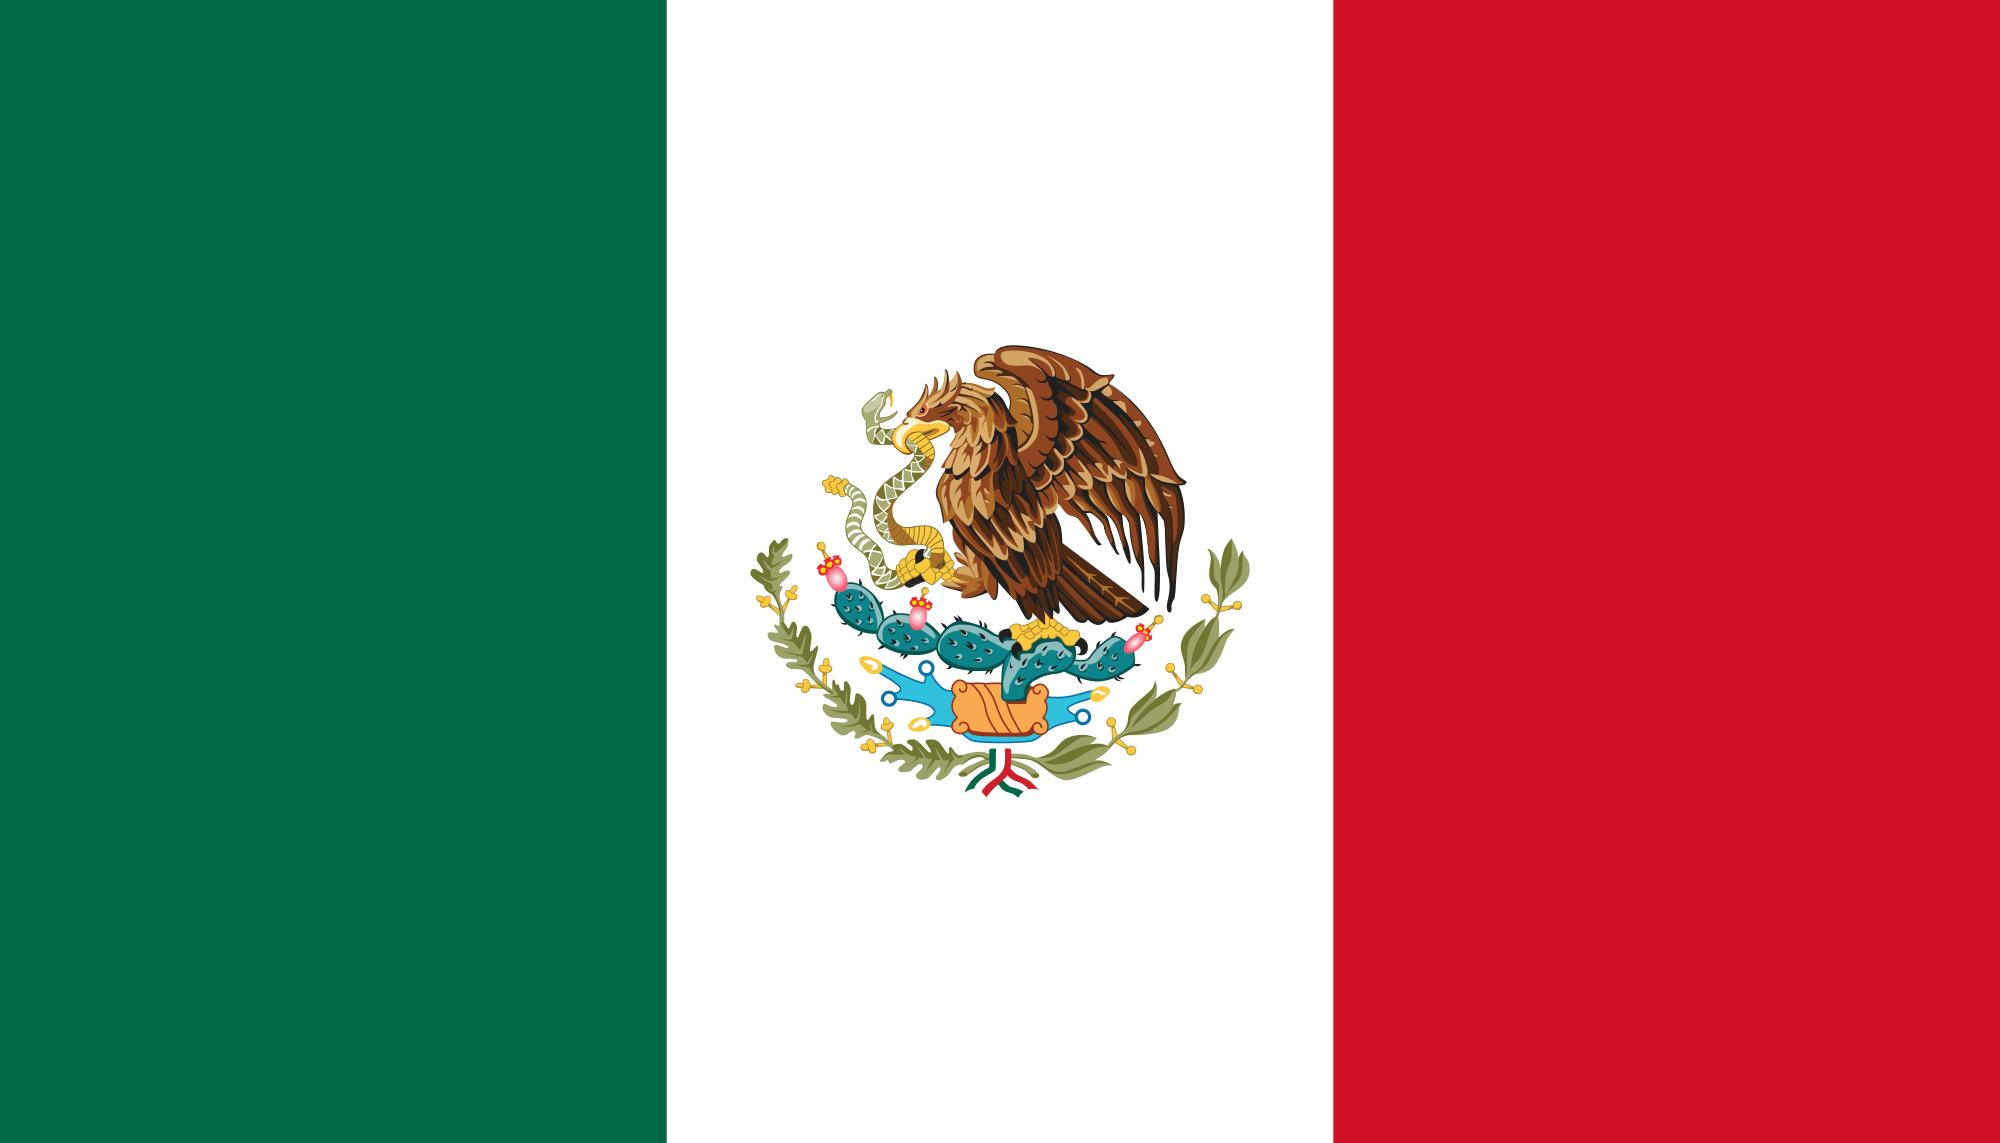 México - Campeonato Mundial de Vôlei Feminino 2018